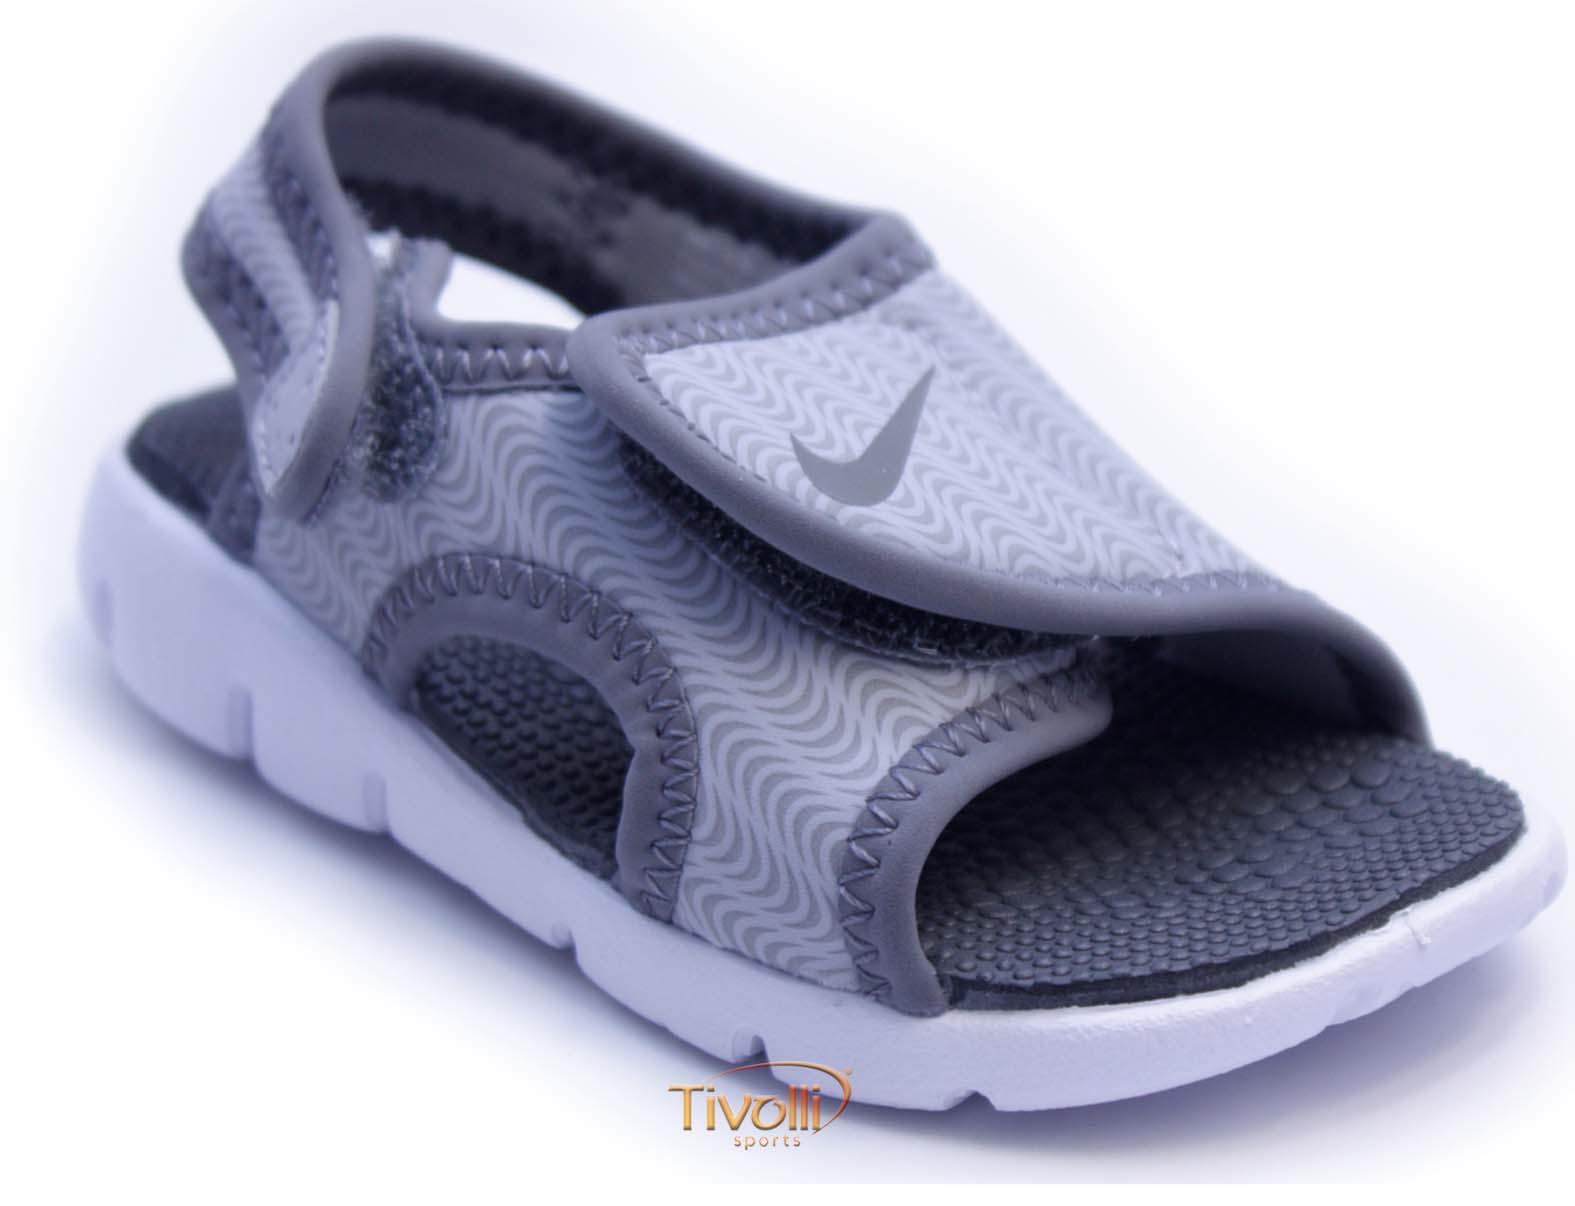 Sandália Papete Nike Sunray Adjust 4 Infantil (TDV)   Cinza e Branca   1eff3a964ff8a